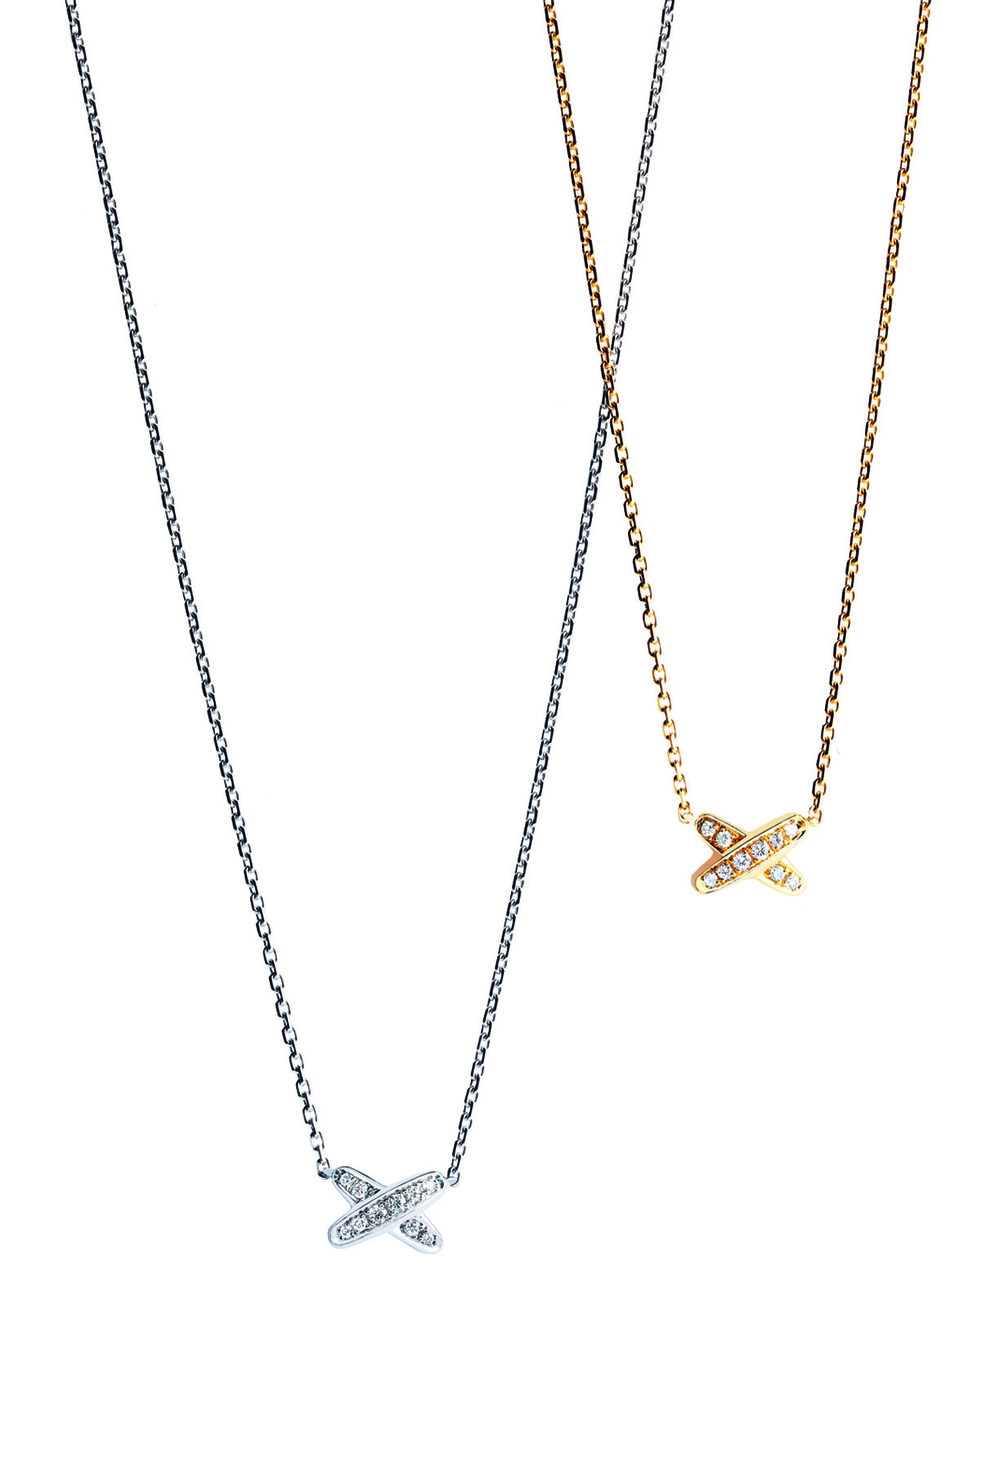 Liens necklaces 2.jpg